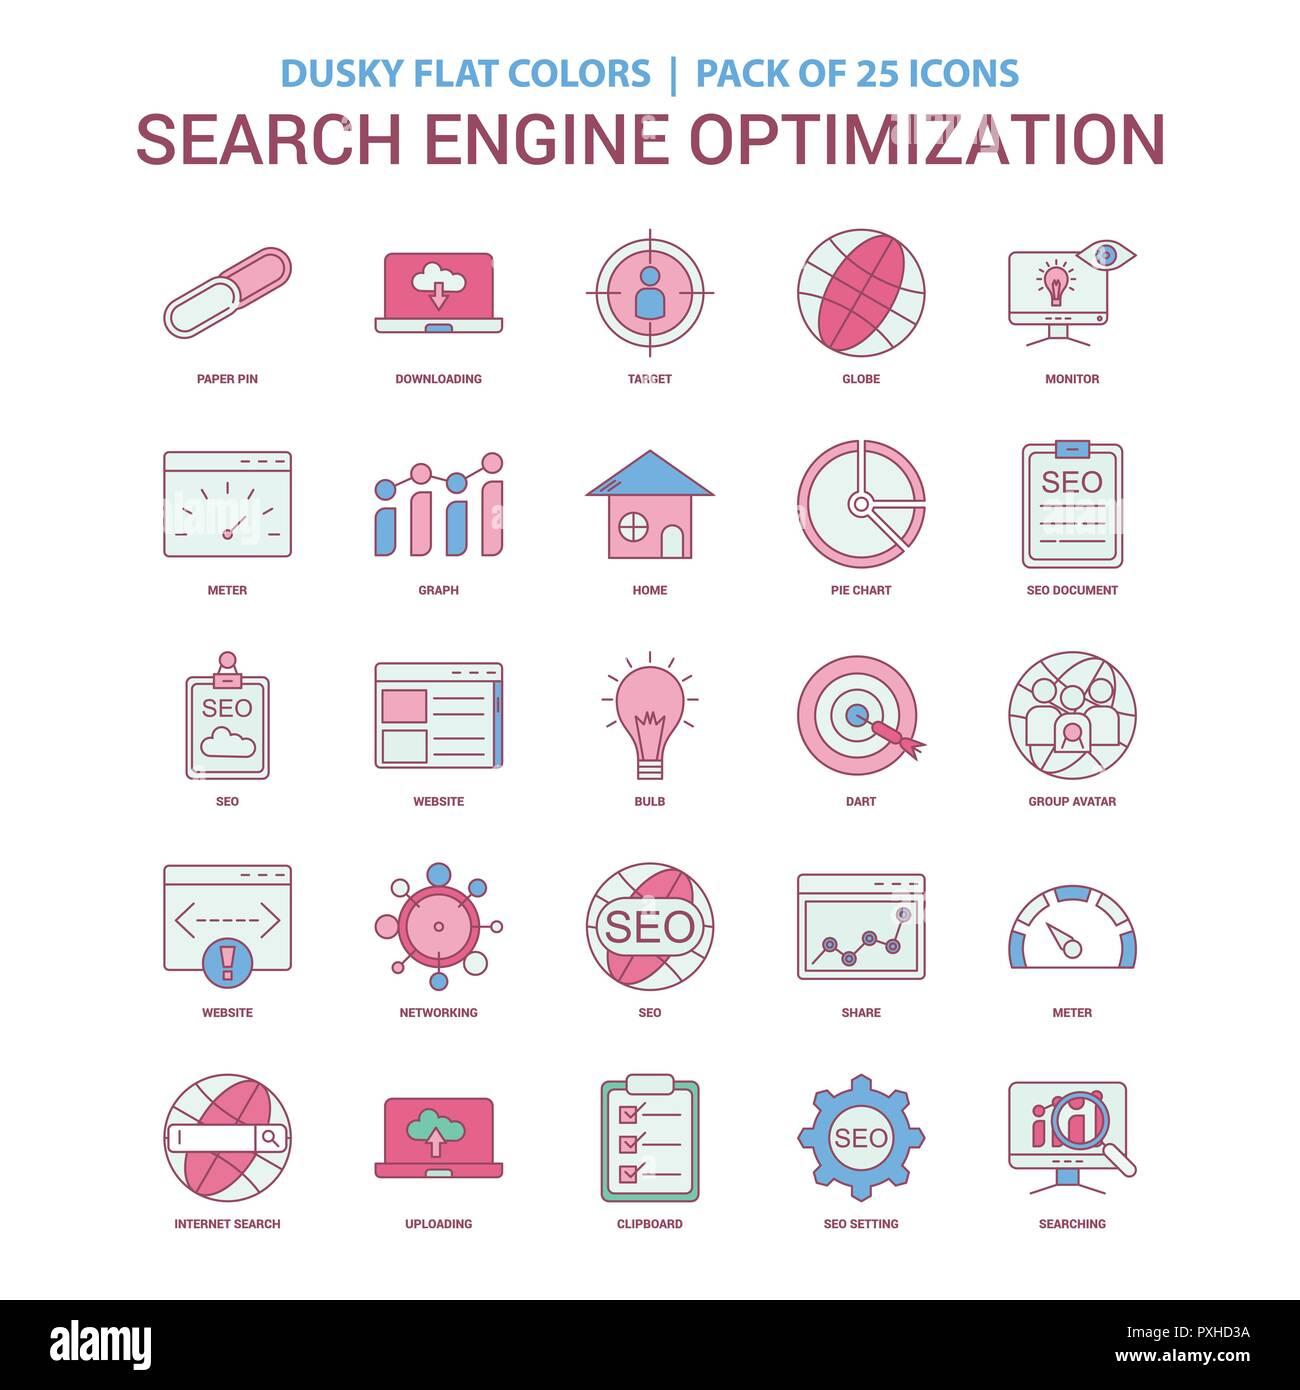 Search Engine Optimization icon Dusky Flat color - Vintage